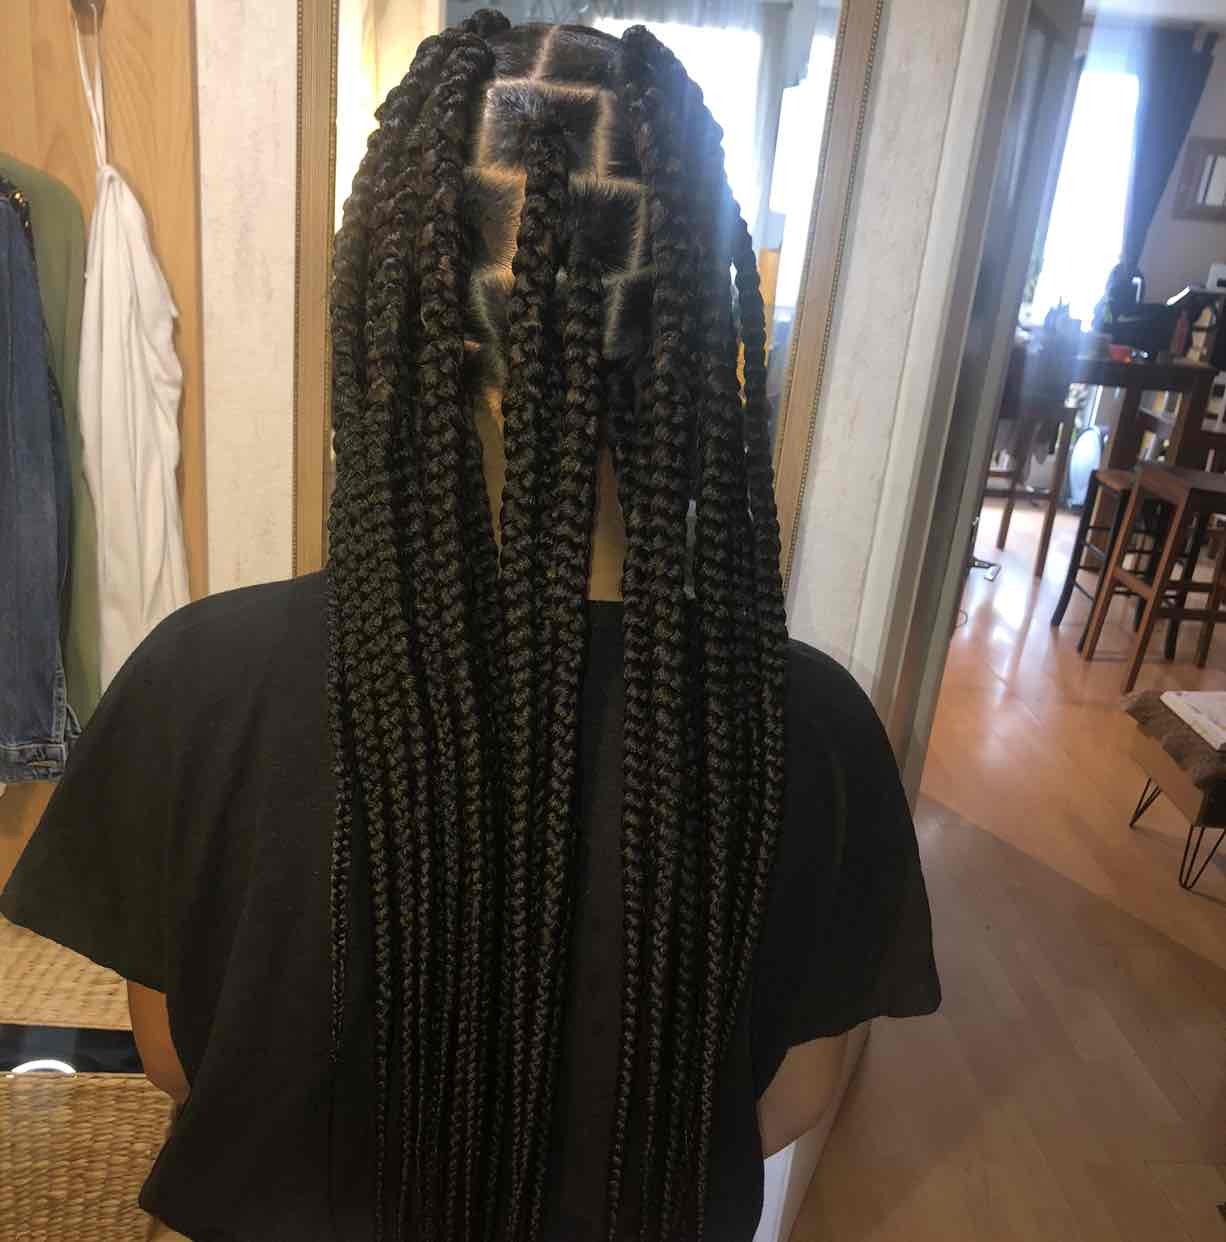 salon de coiffure afro tresse tresses box braids crochet braids vanilles tissages paris 75 77 78 91 92 93 94 95 NMAQQNXA